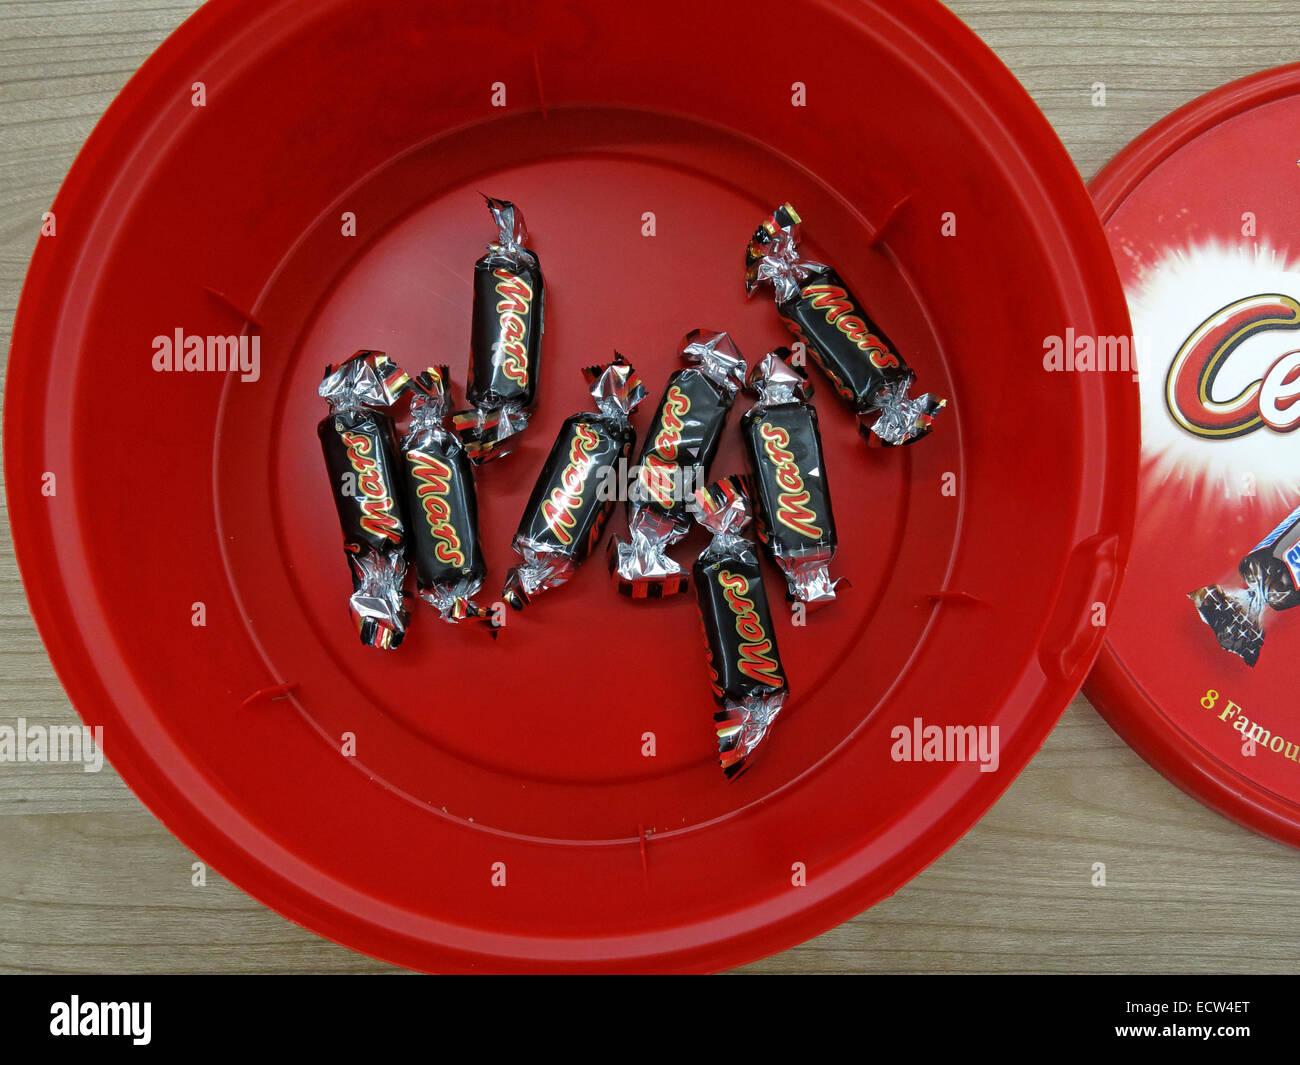 Xmas,least,the,at,Christmas,red,Mars,Bars,Marsbars,Marsbar,gotonysmith